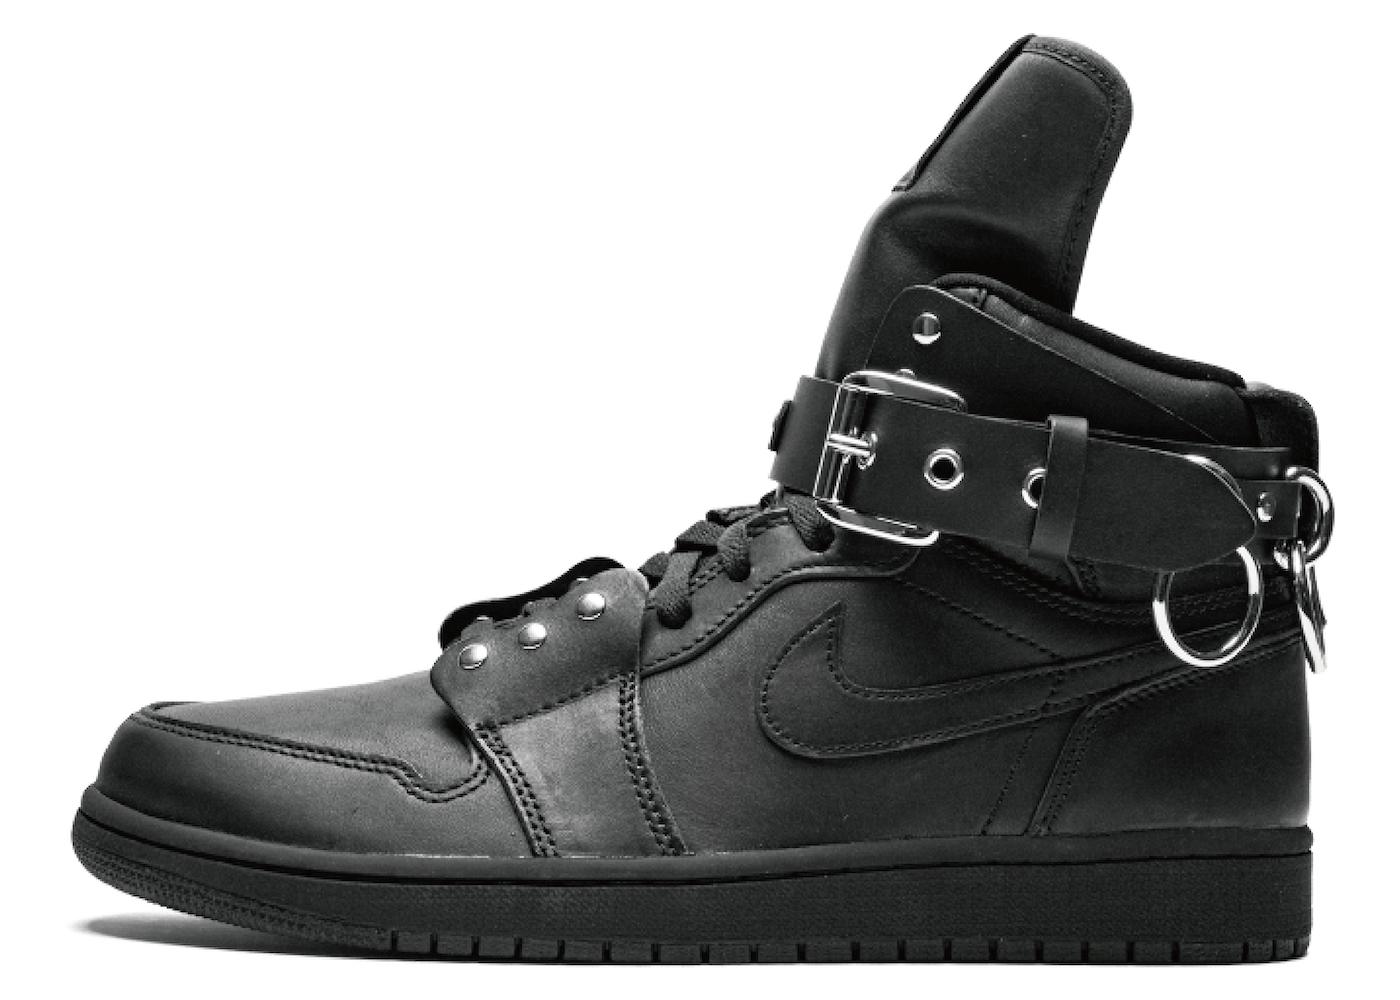 Comme des Garcons × Nike Air Jordan 1 Retro High Blackの写真